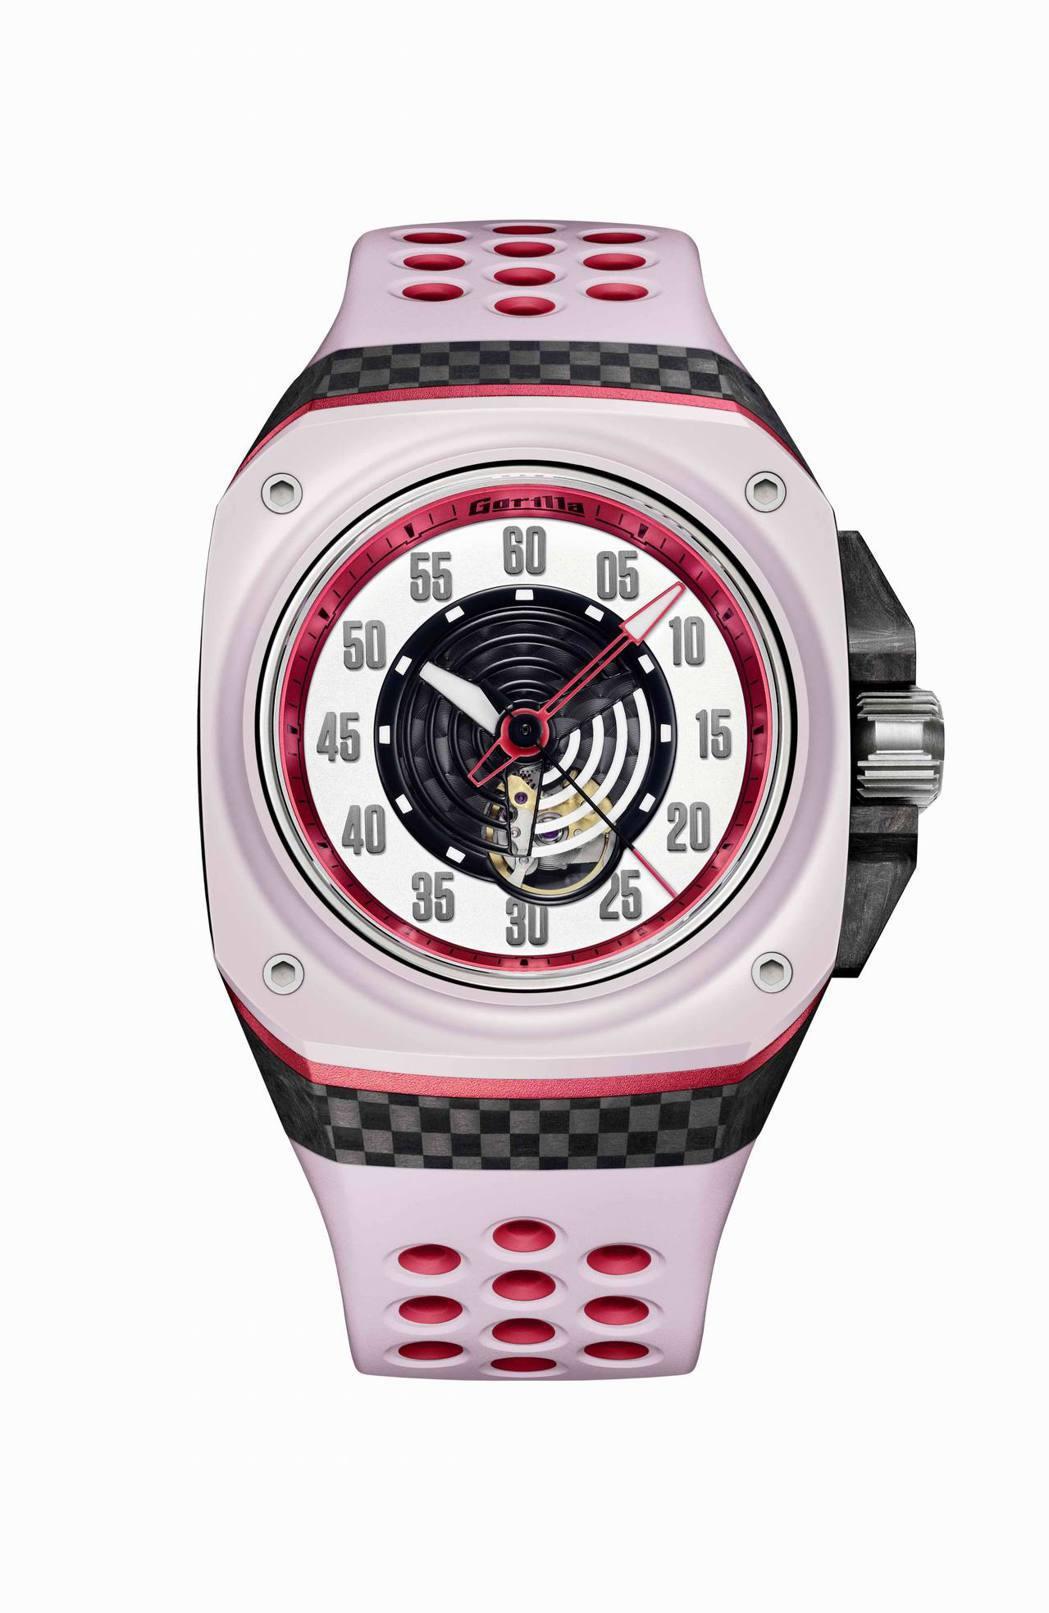 Gorilla Fastback GT Truffelhunter大三針腕錶,建...